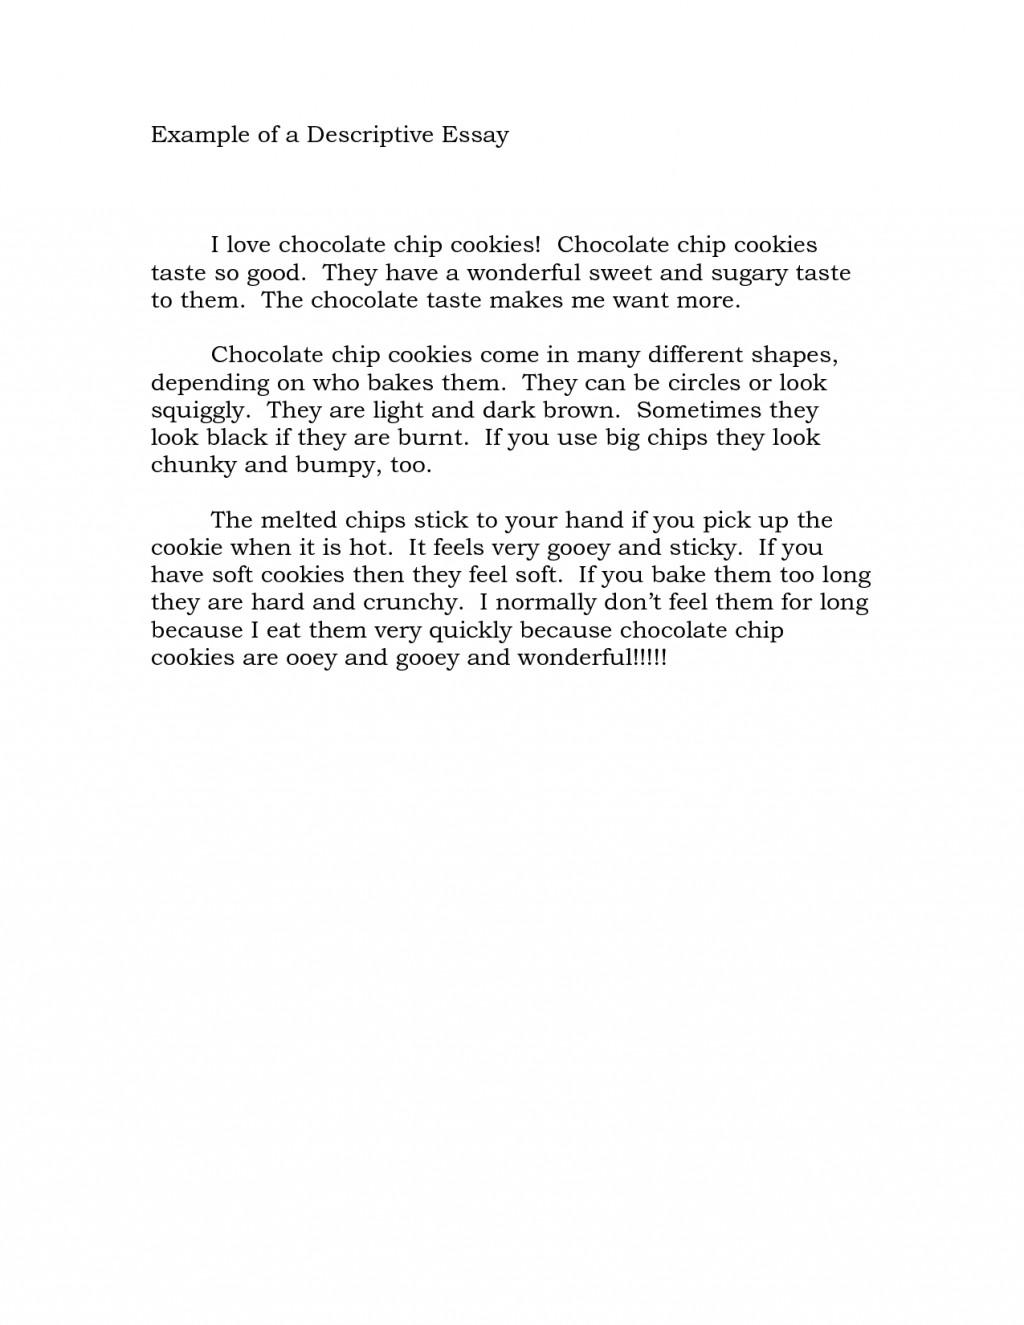 017 Descriptive Essay Outlines 705115 Outstanding Outline Template Pdf About A Person Large